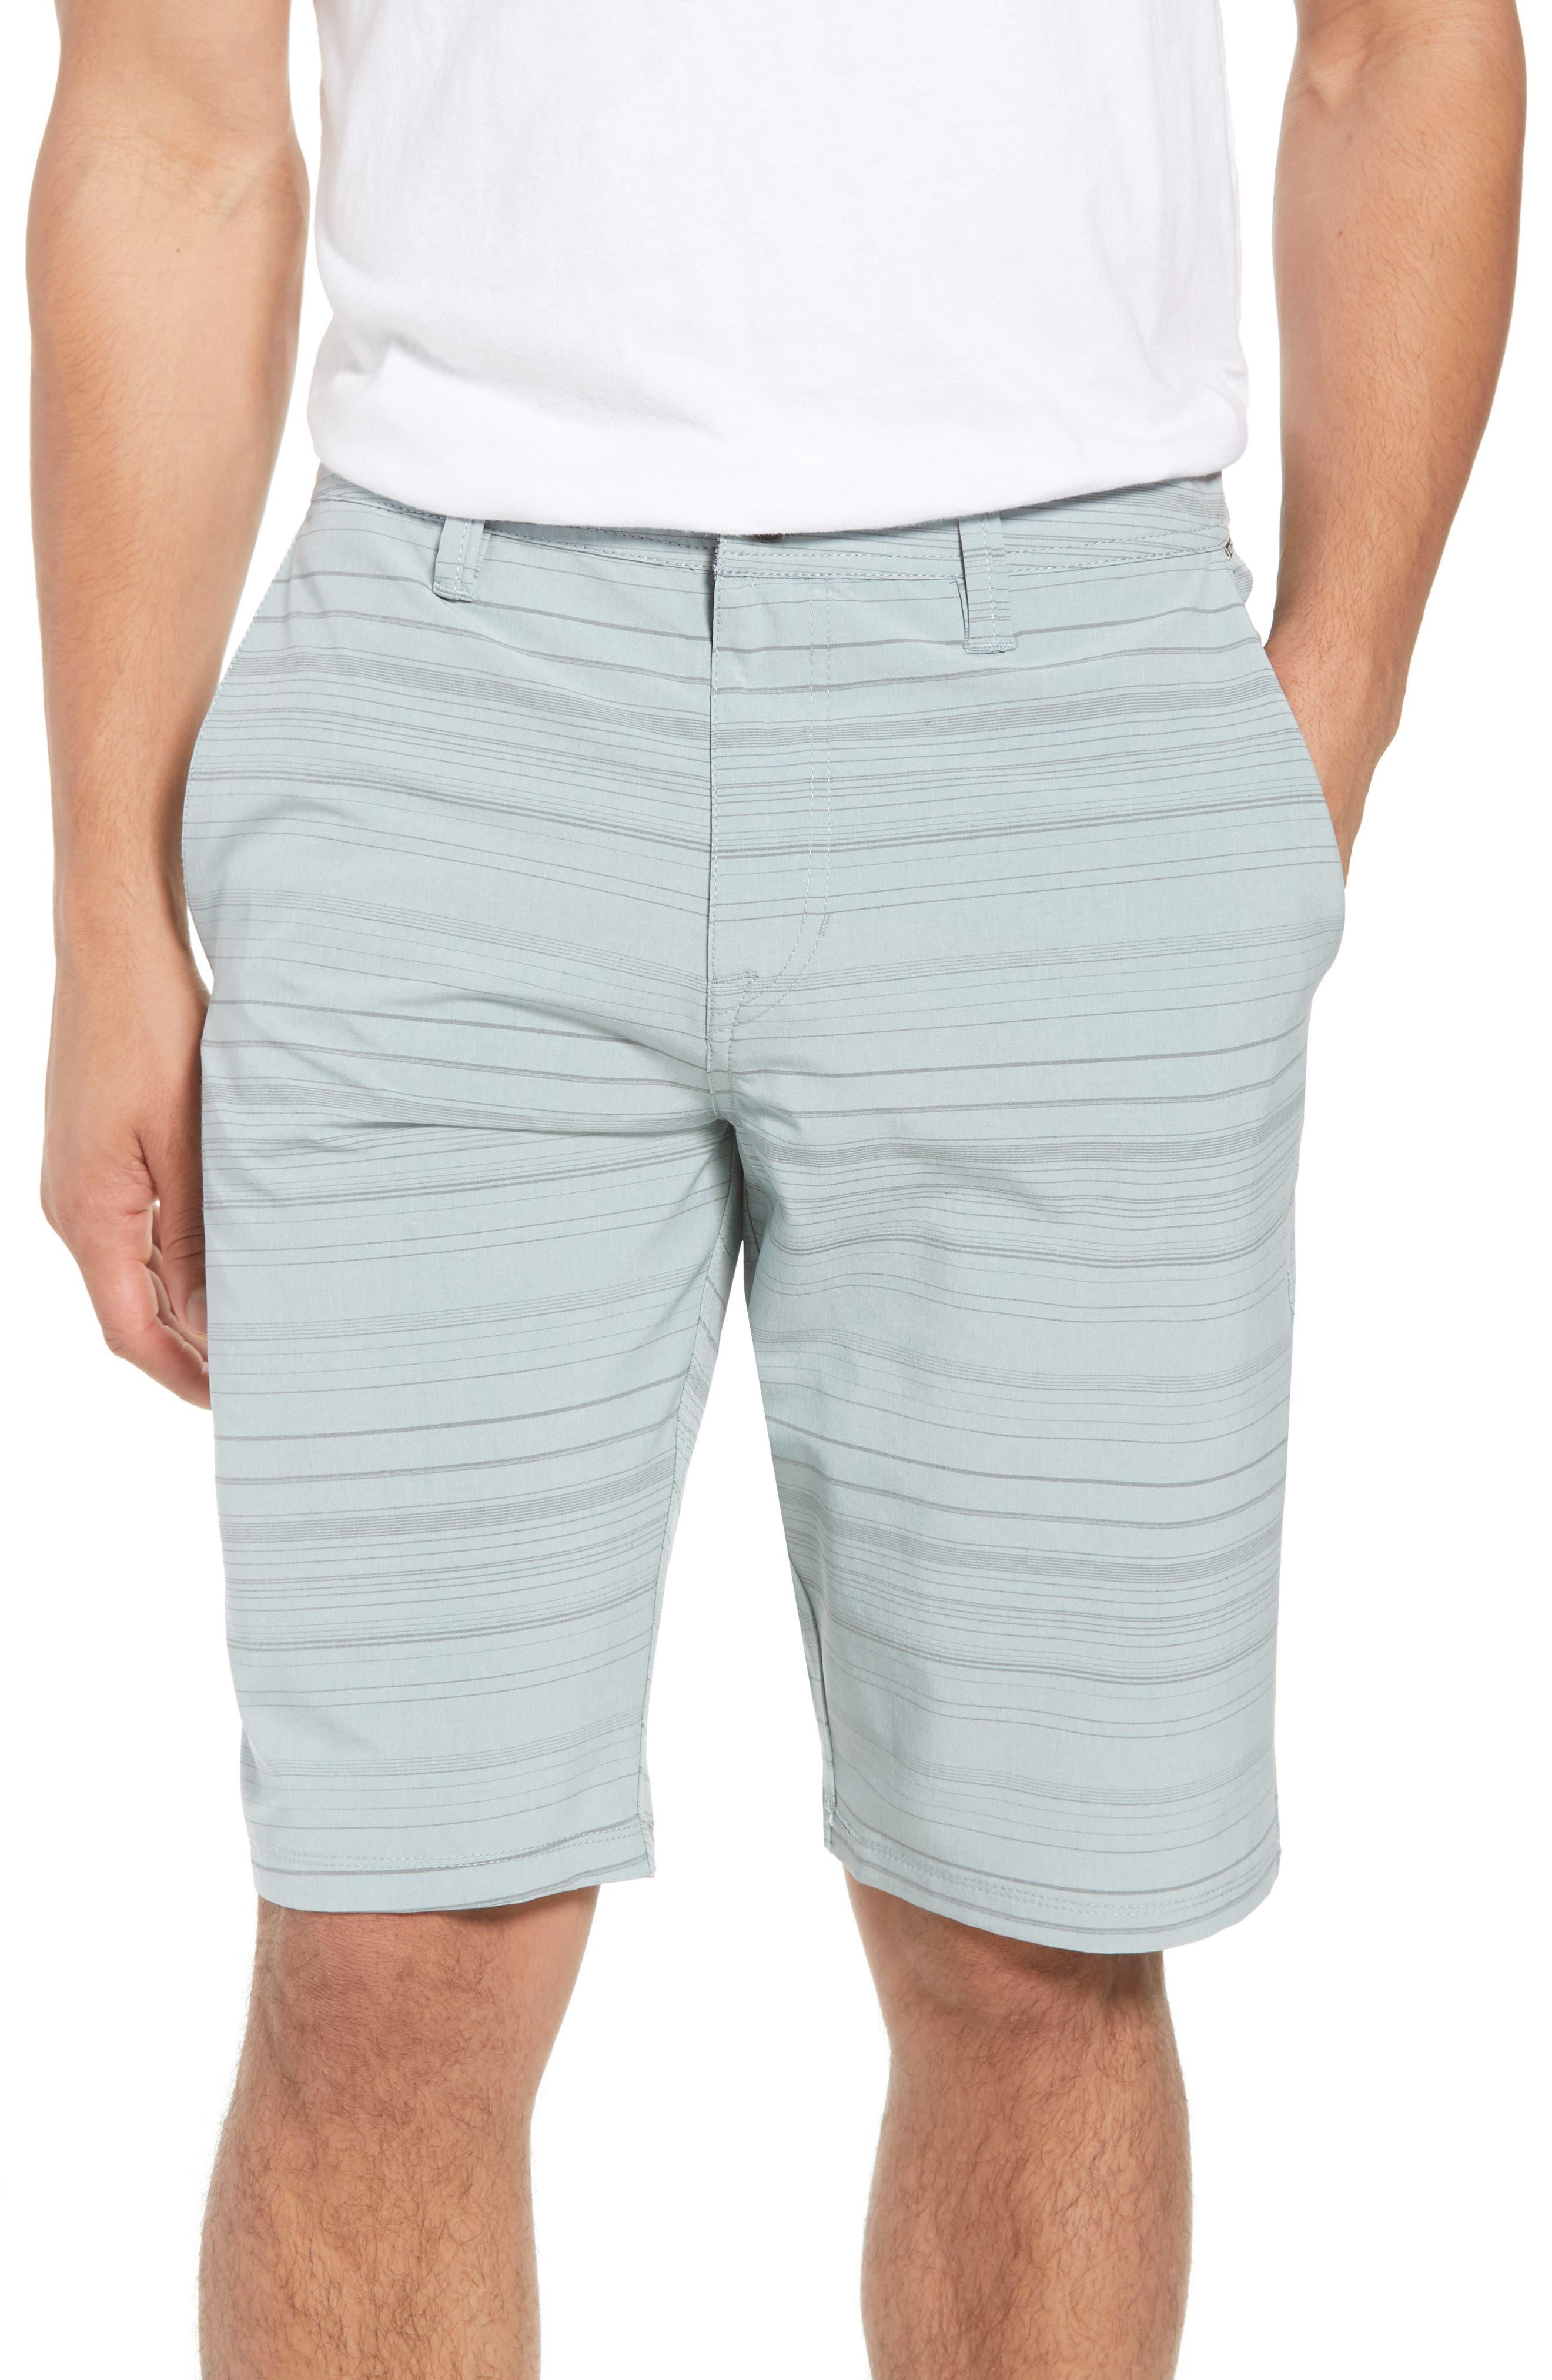 Surf N' Turf Mix Hybrid Shorts,                             Main thumbnail 1, color,                             Lead